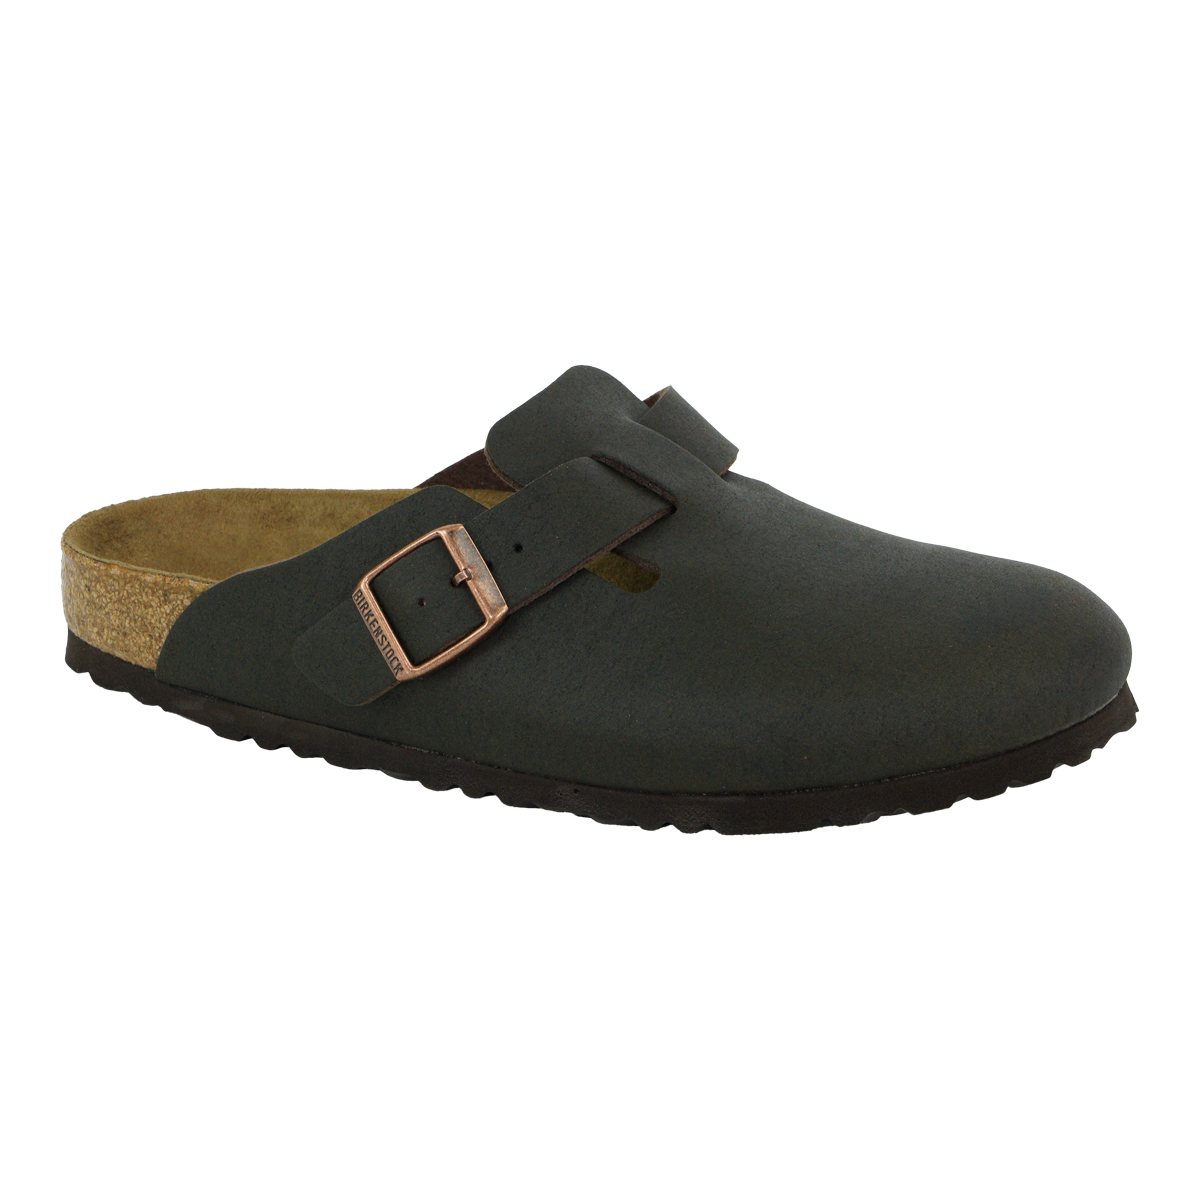 Details about Birkenstock Boston Shoes Micro Fibre Cocoa Brown 46 N